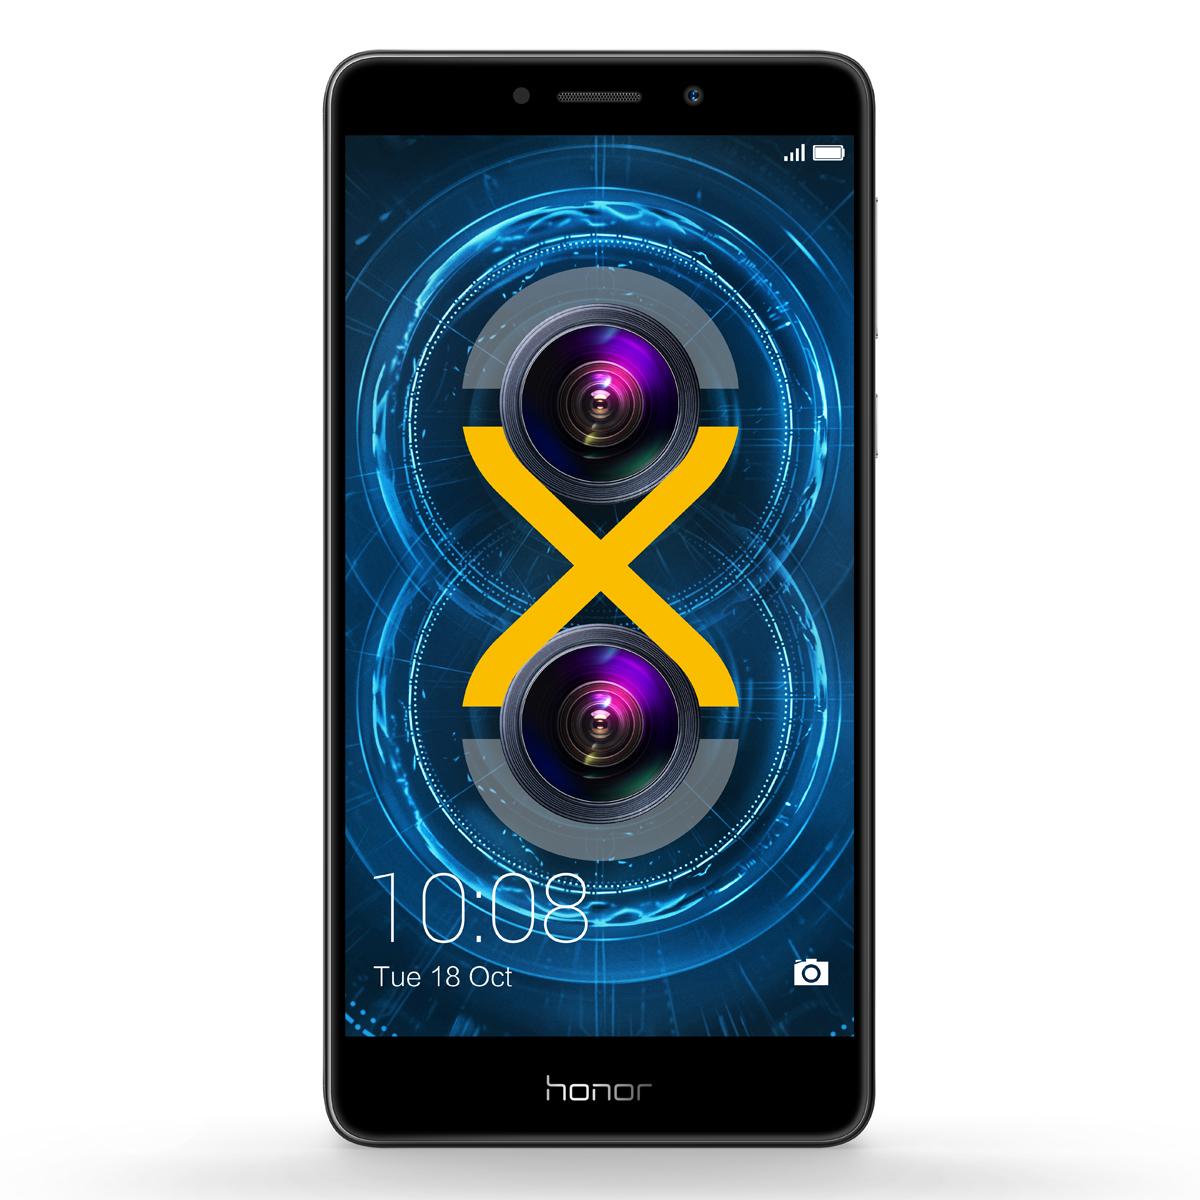 Honor 6X Smartphone (13,97 cm (5,5 Zoll) Full HD Display, 32 GB Speicher, Android, Dual SIM, 2.1GHz OctaCore-CPU, 12MP Dual-Kamera, Grau)  [Saturn/eBay]